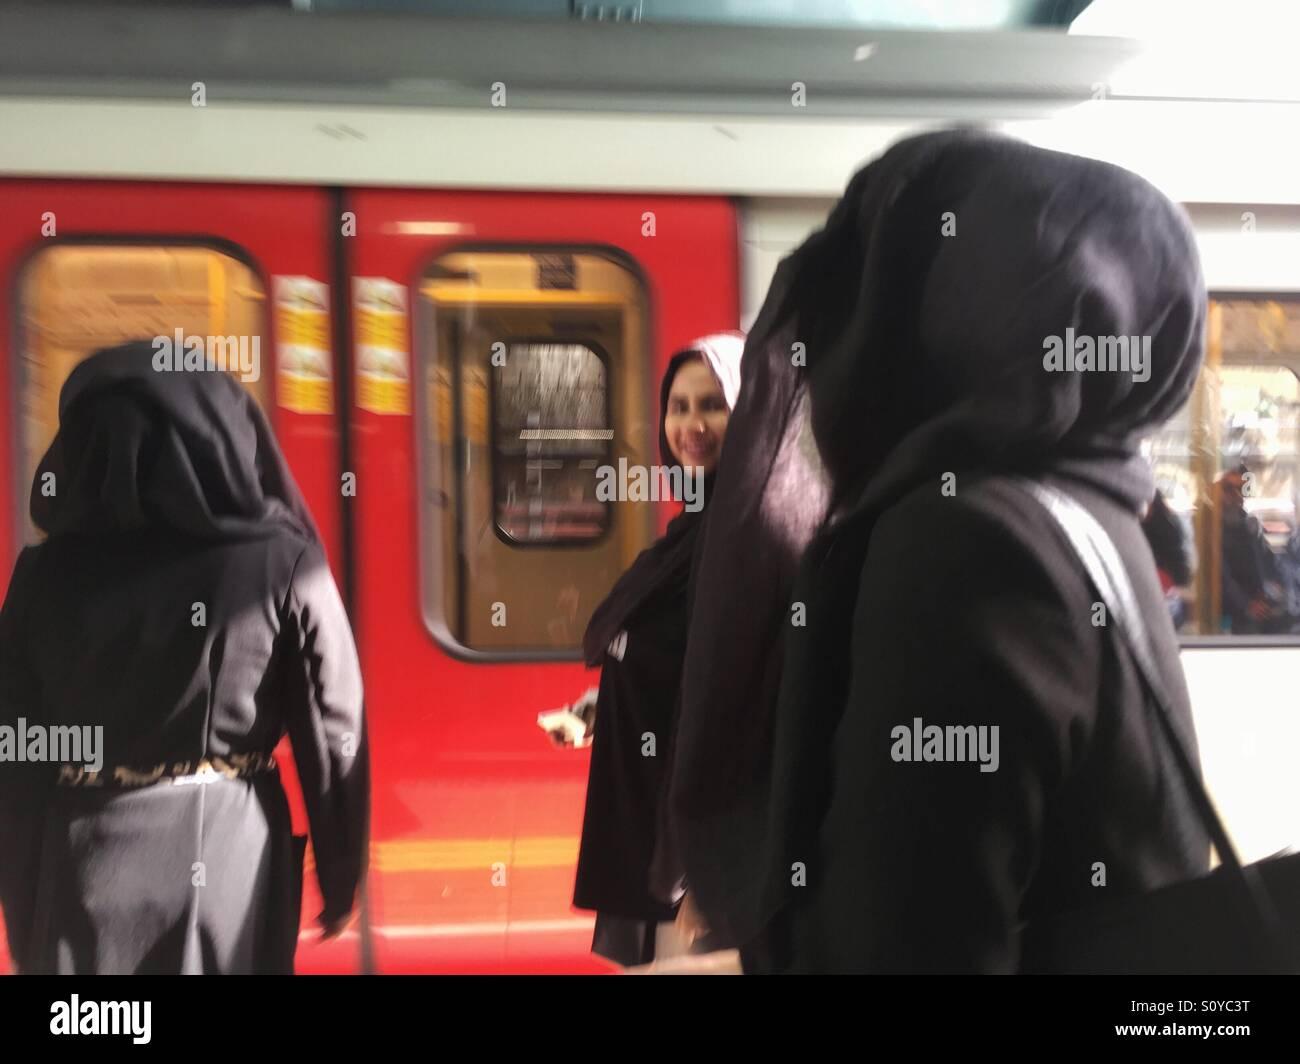 Les femmes musulmanes en hijab, burqa ou niqab à Whitechapel, Londres, Royaume-Uni Photo Stock